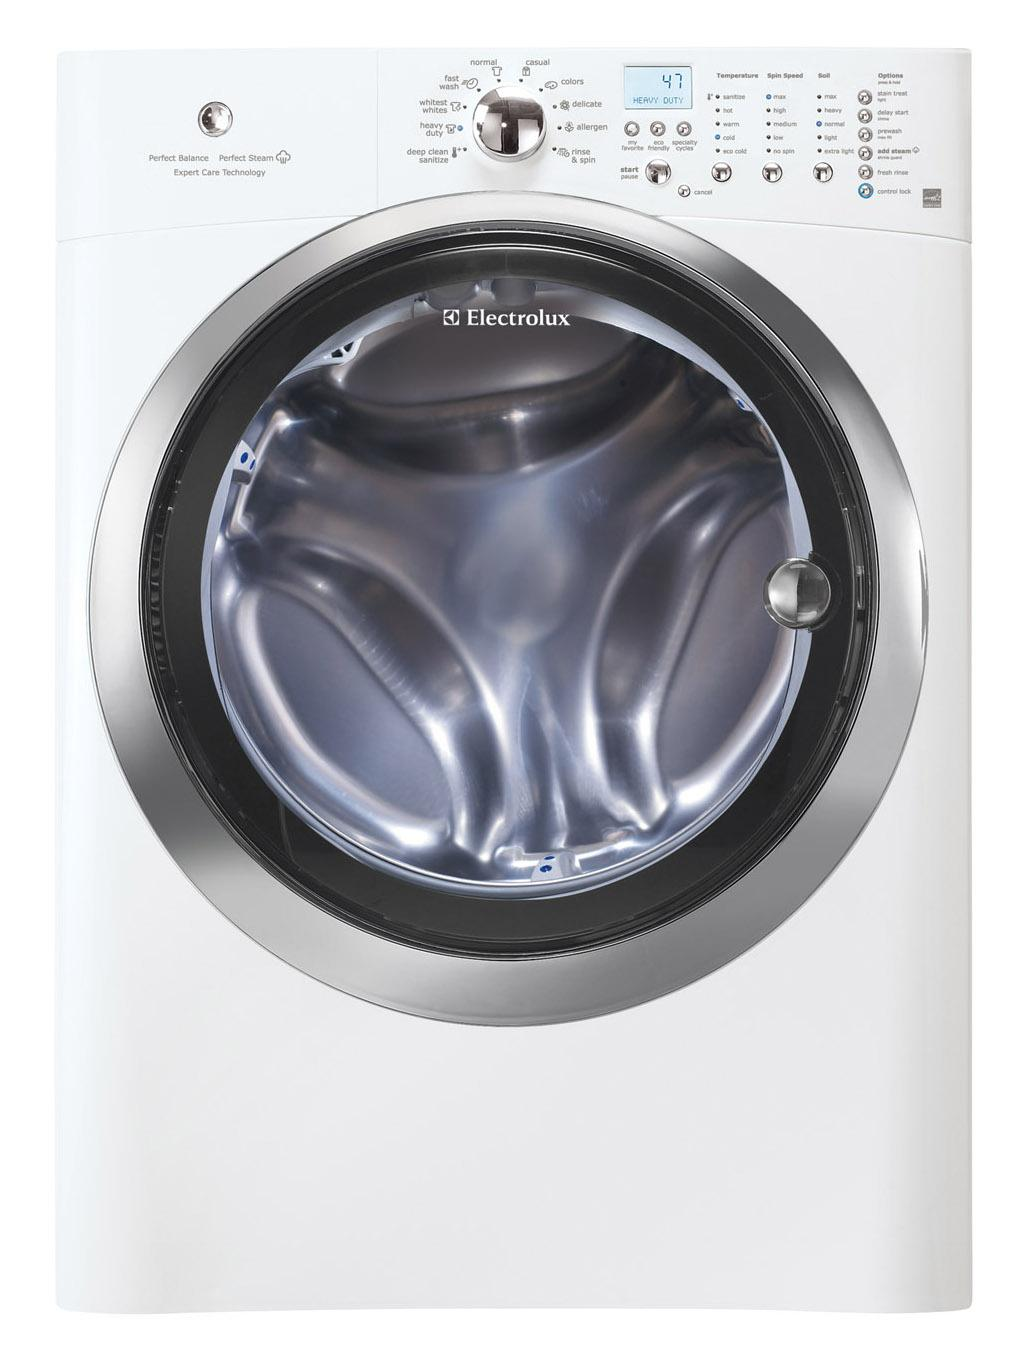 Electrolux Gas Dryers 8.0 Cu. Ft. Front Load Gas Dryer - Item Number: EIMGD60JIW